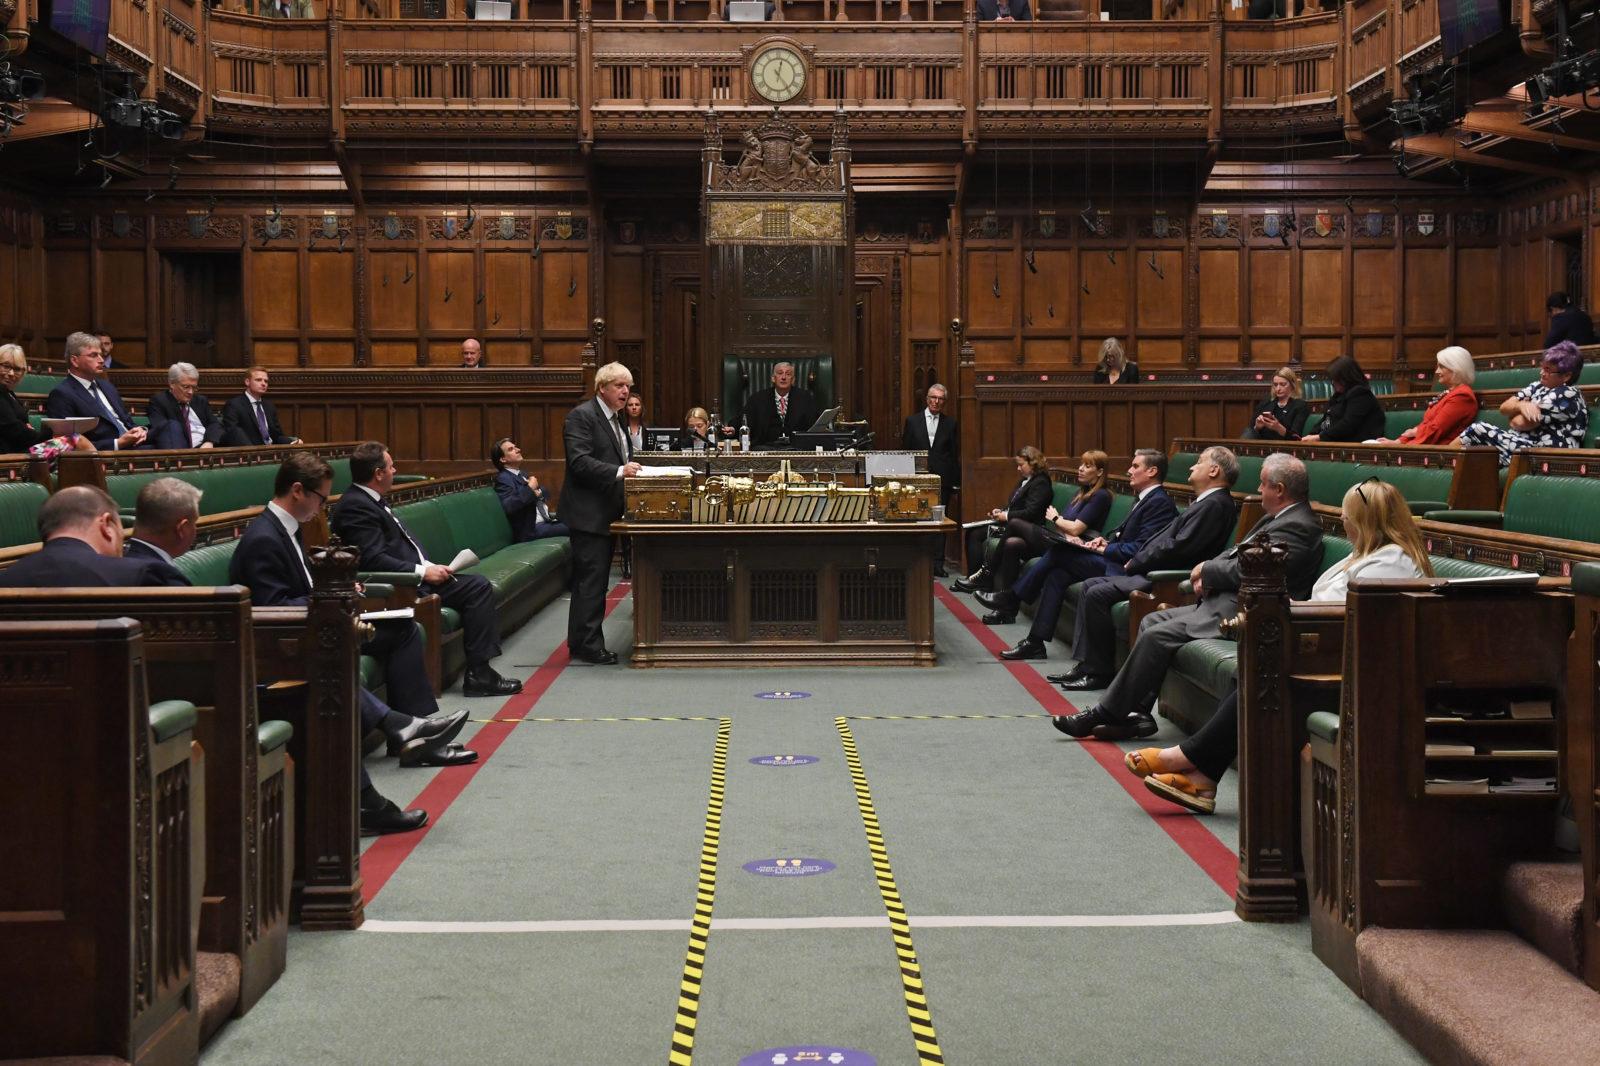 Boris Johnson apologises after he 'misspoke' on rule of six